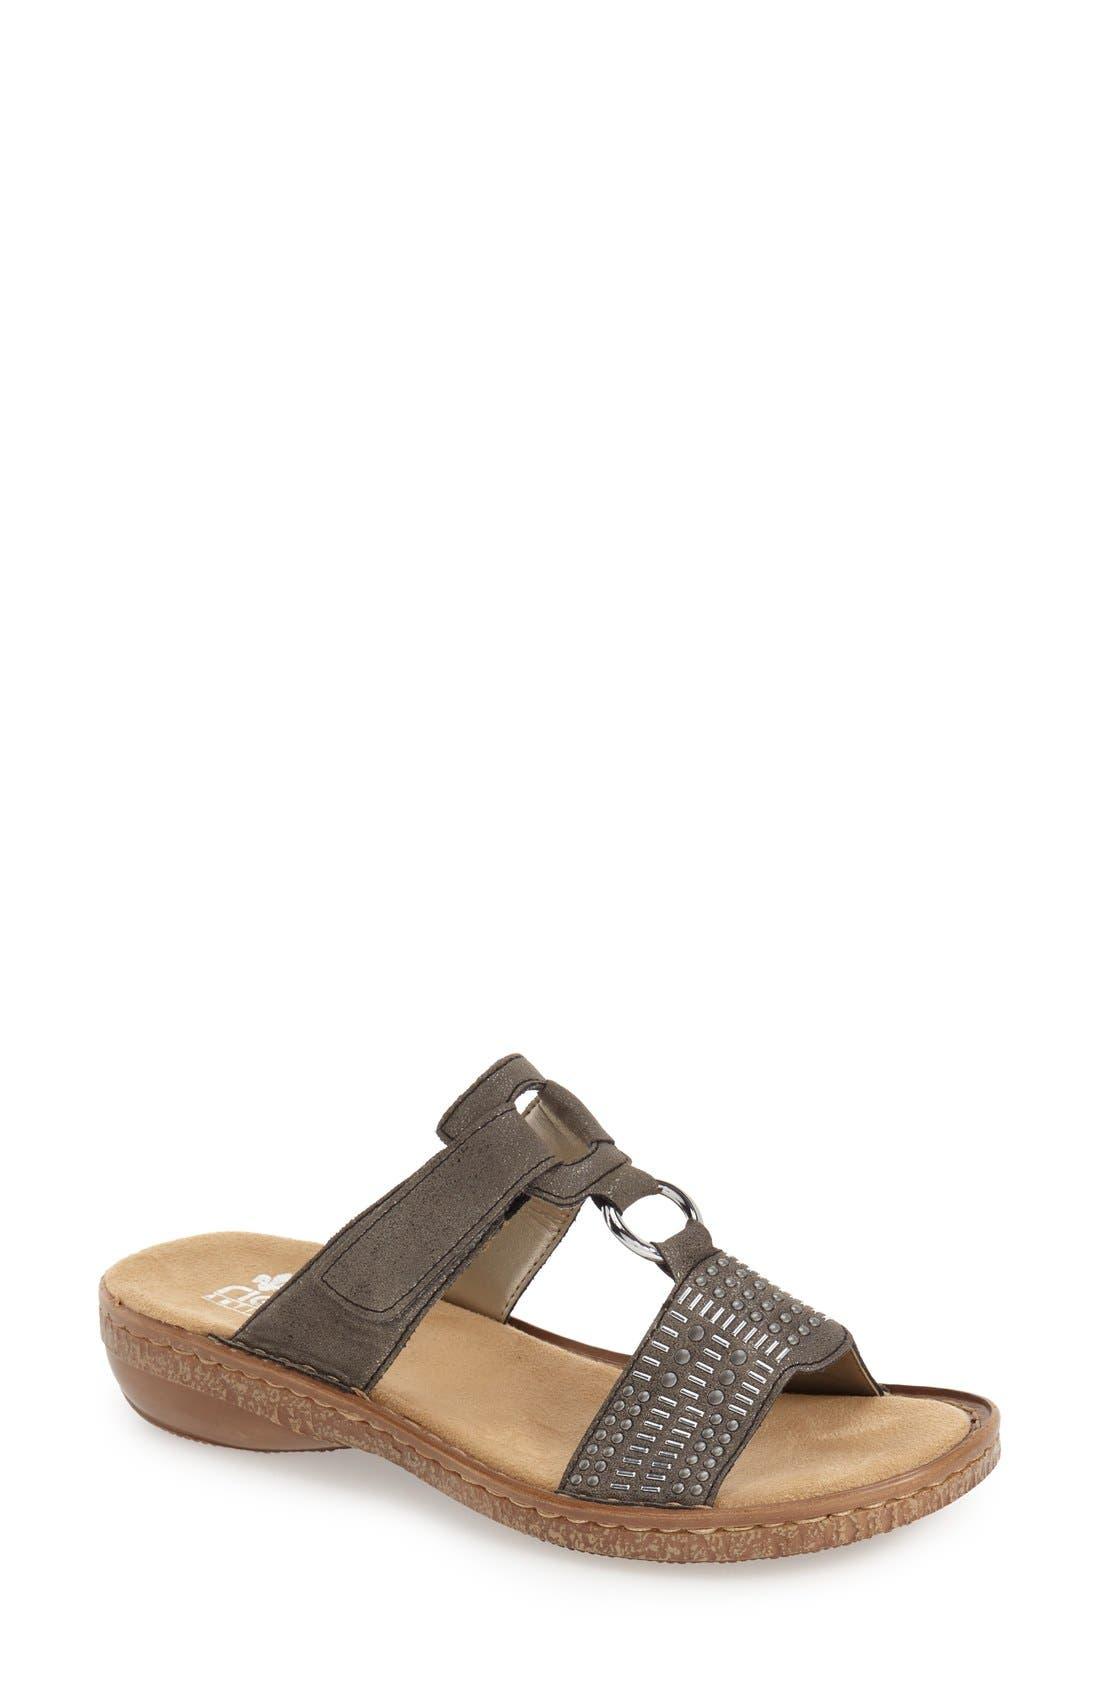 Main Image - Rieker Antistress 'Regina' Slide Sandal (Women)